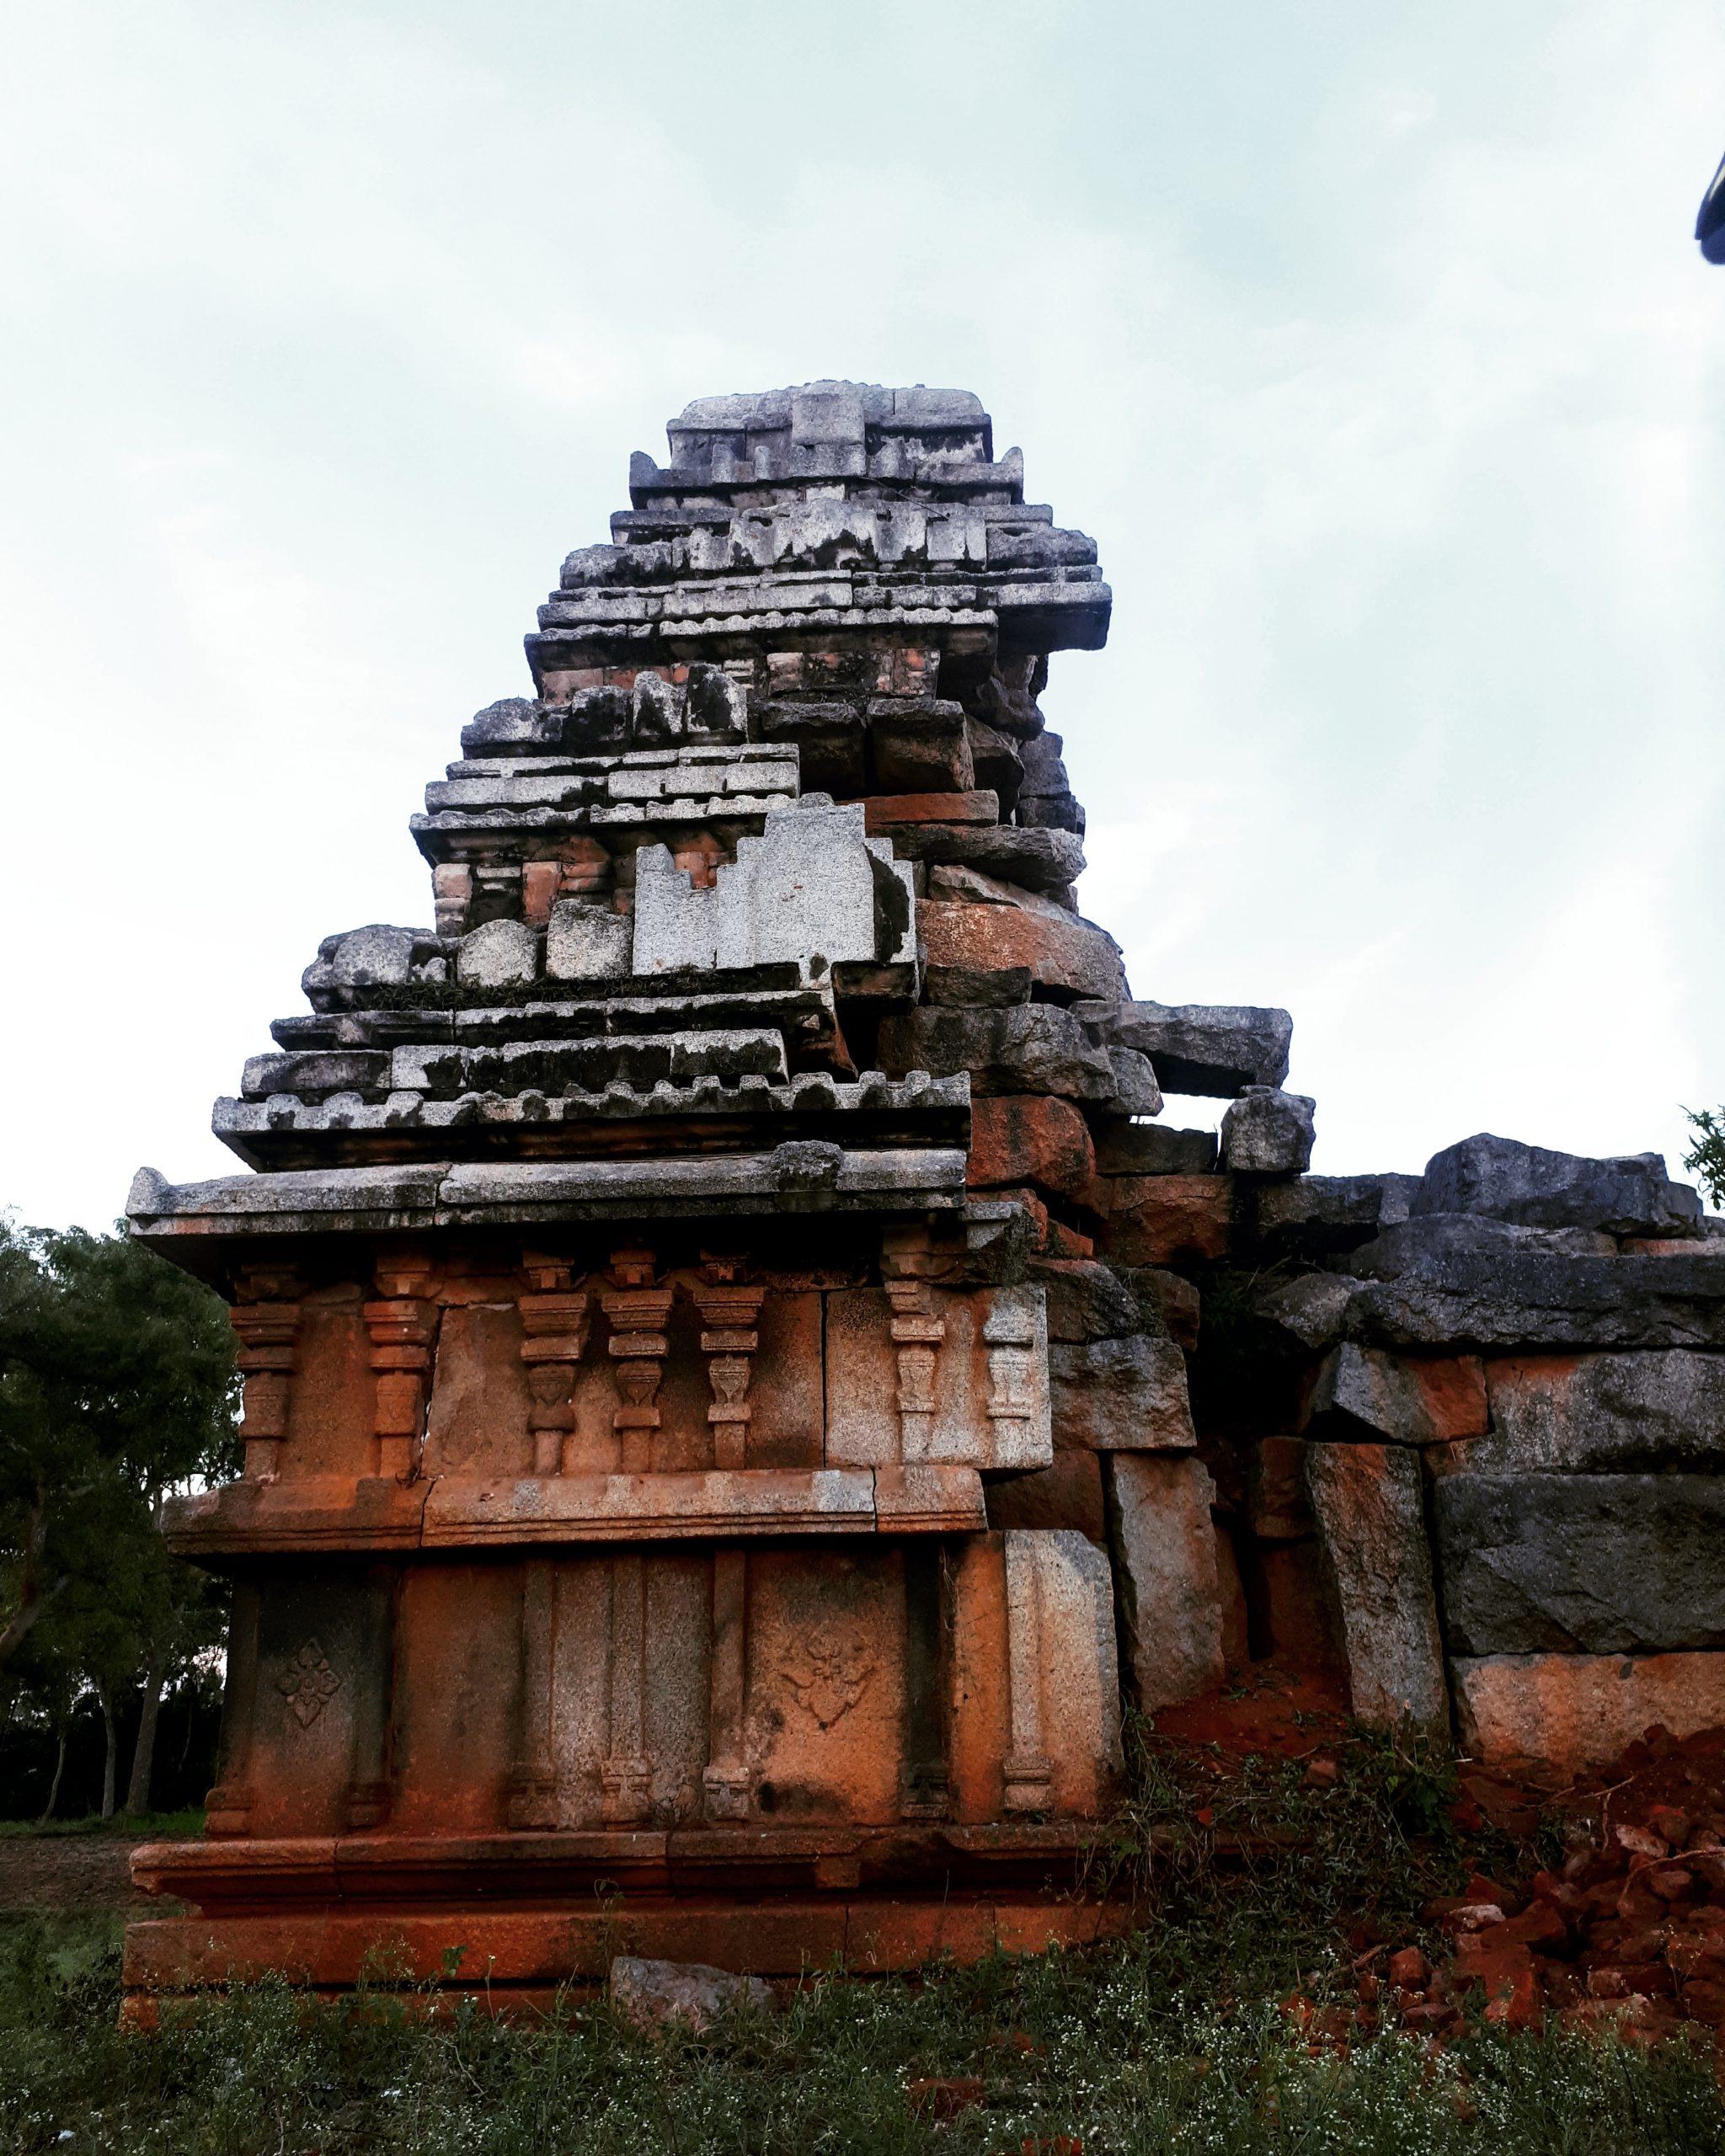 Hindu Temple Structure on Focus